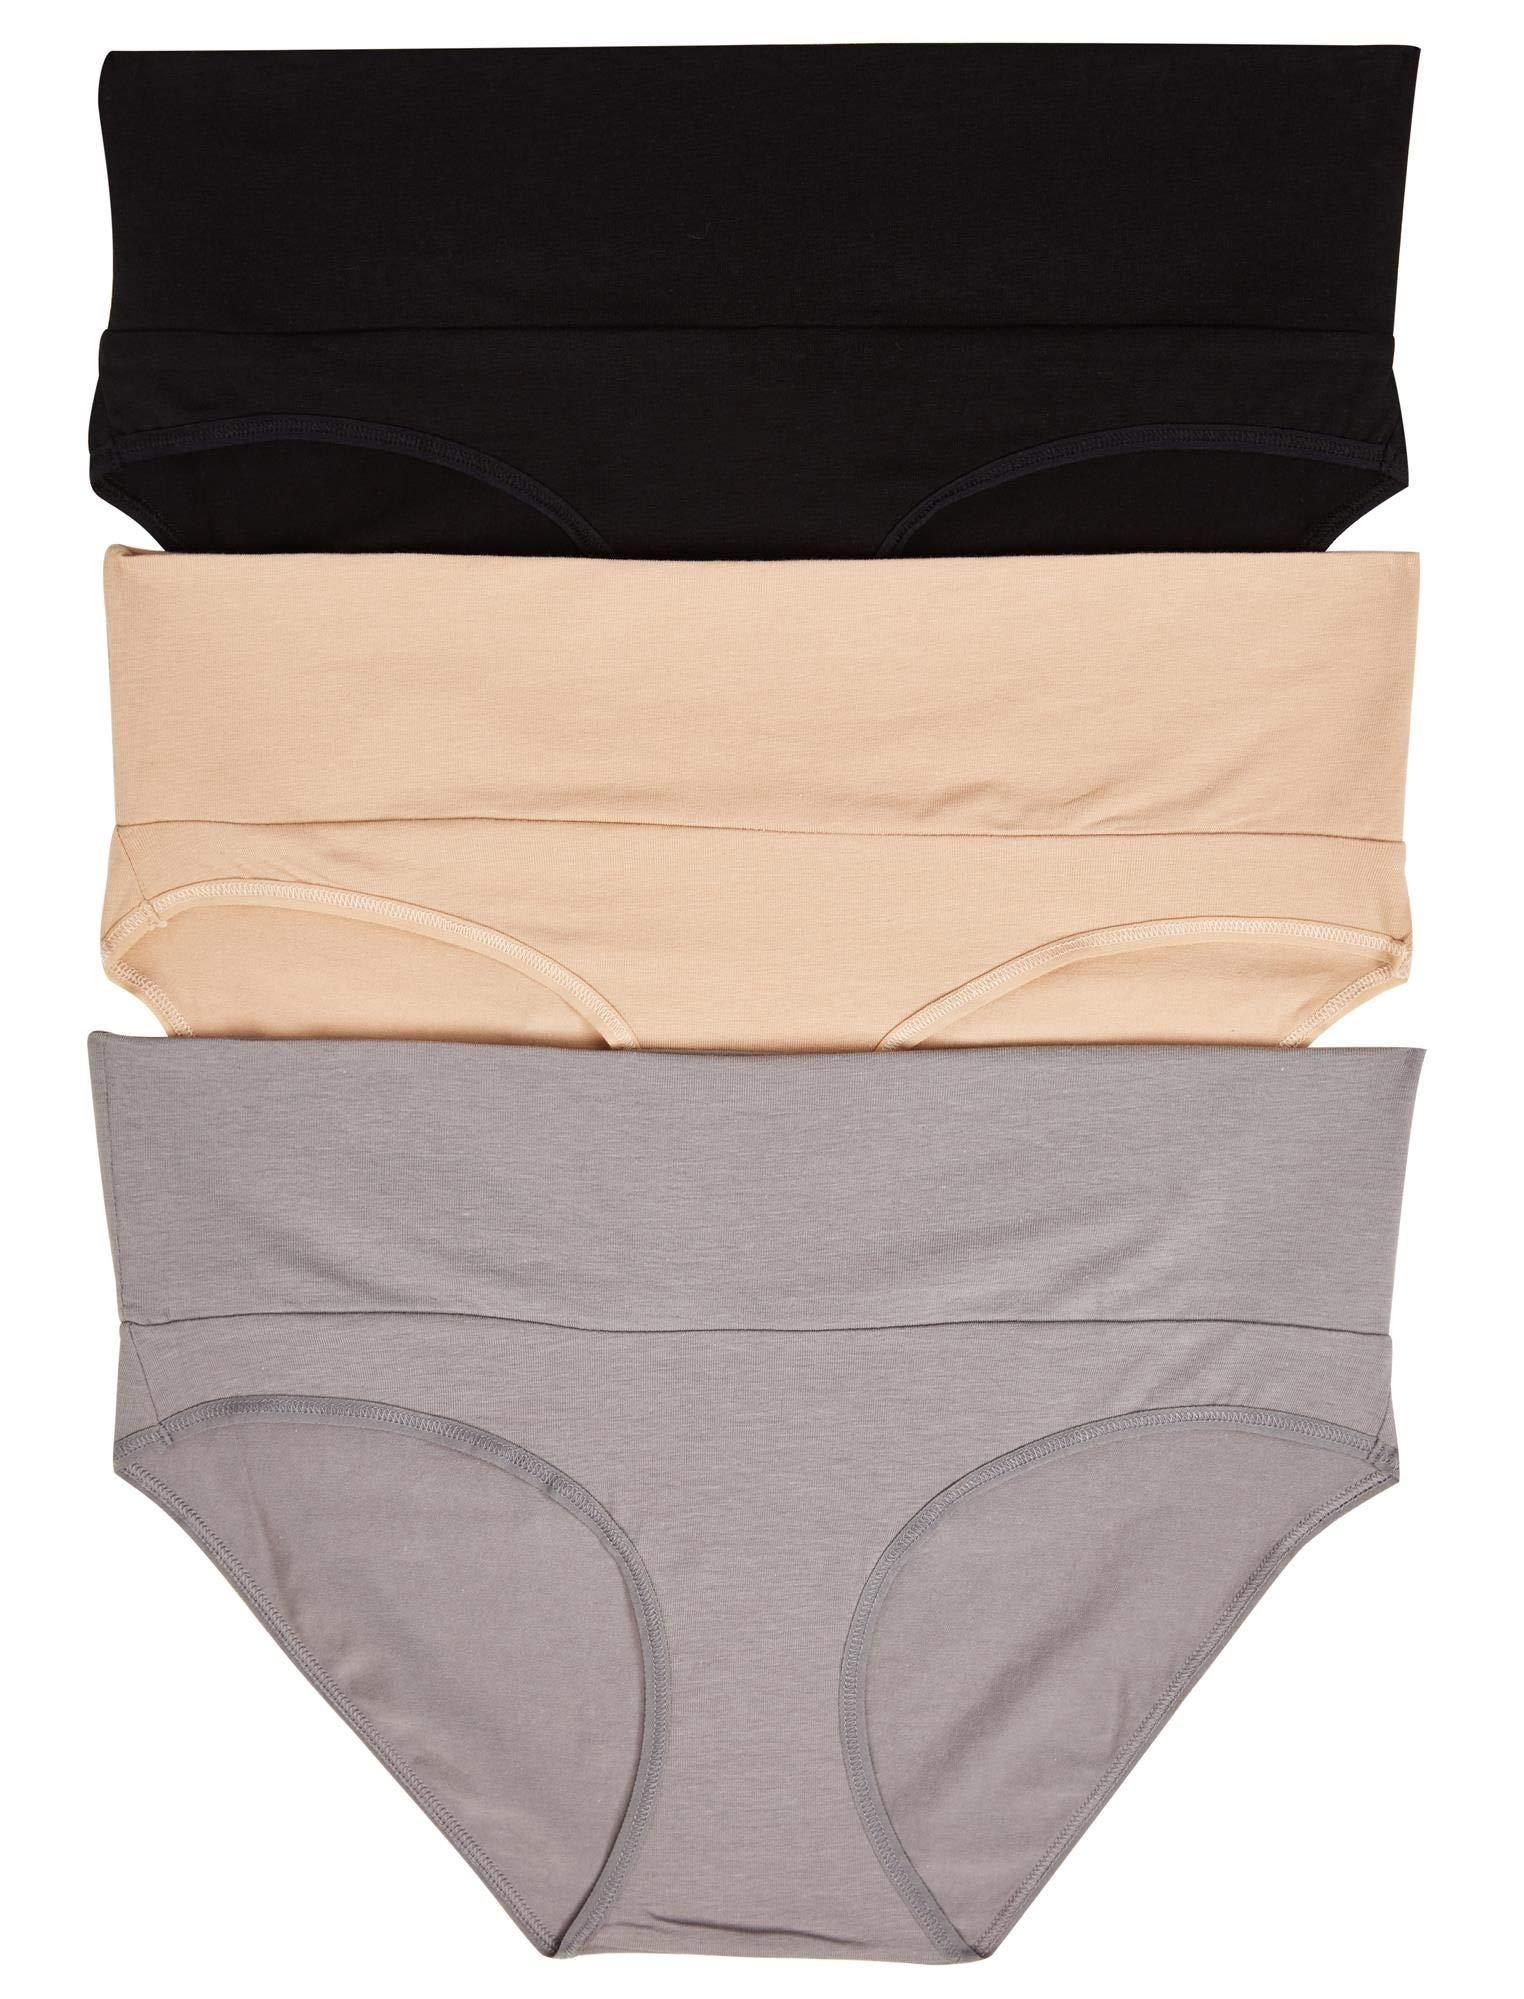 Motherhood Maternity Women's 3 Fold Over Brief Panties, Black, Nude, Flat Grey/Multi Pack, Large